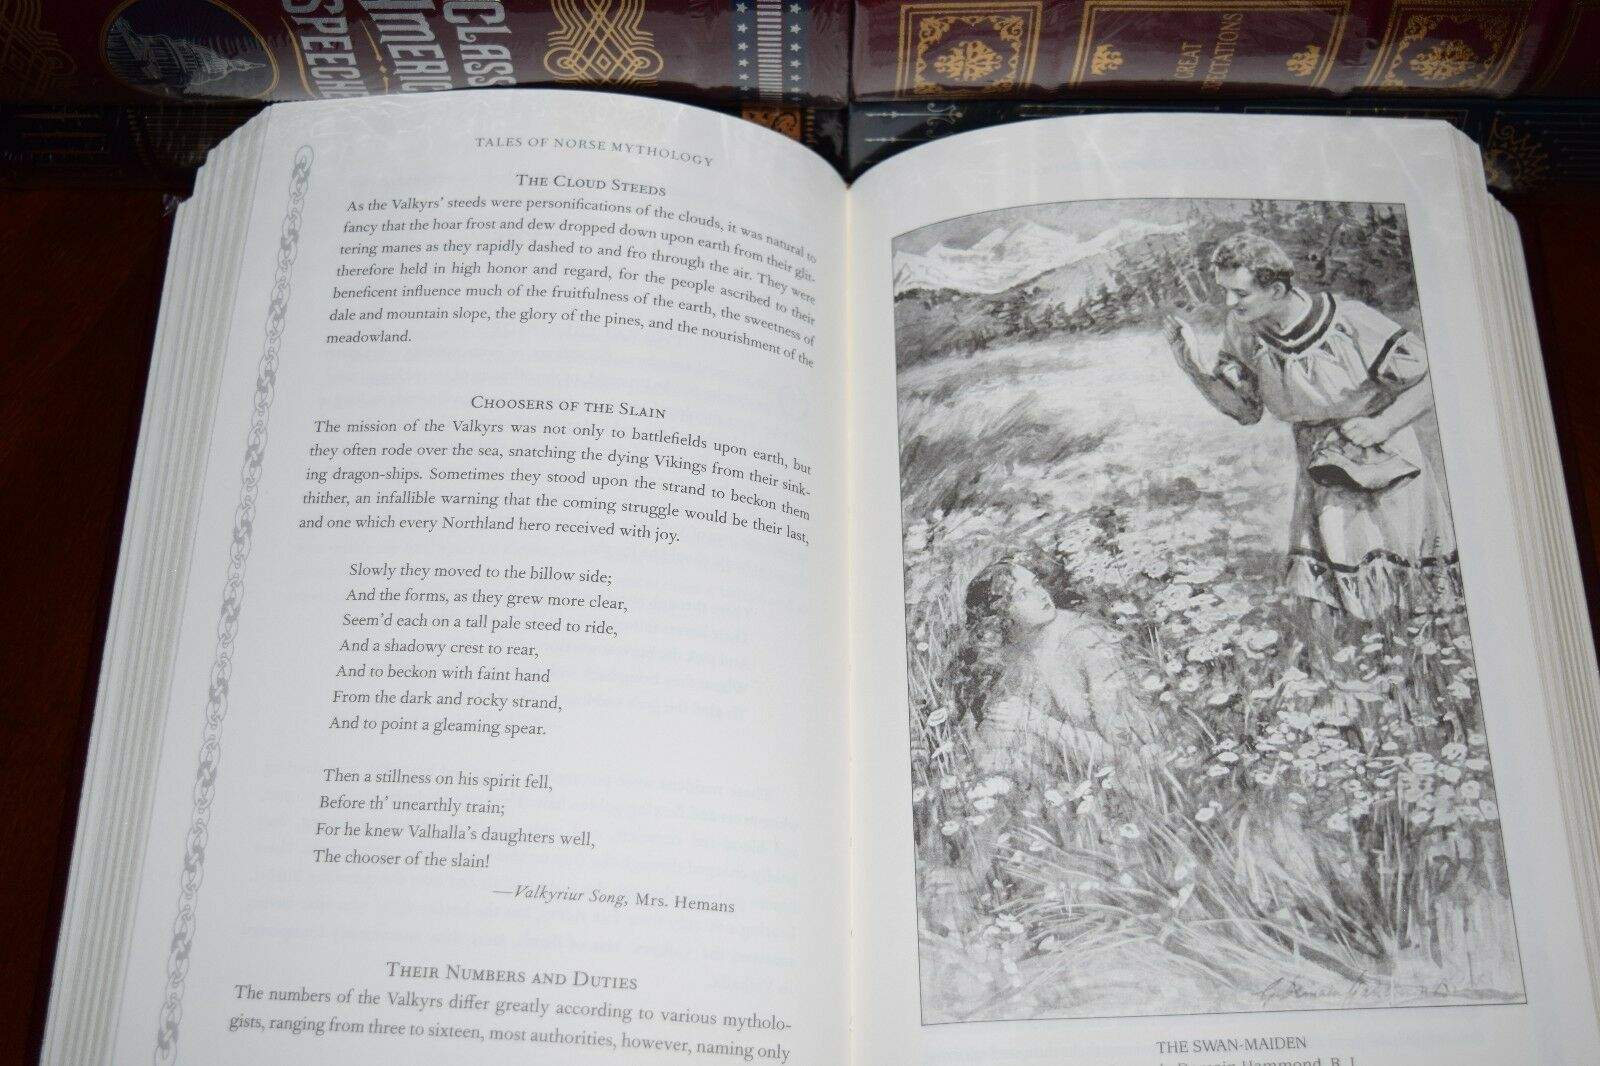 Tales of Norse Mythology Viking Tales Illustrated New Sealed Leather Bound Gift